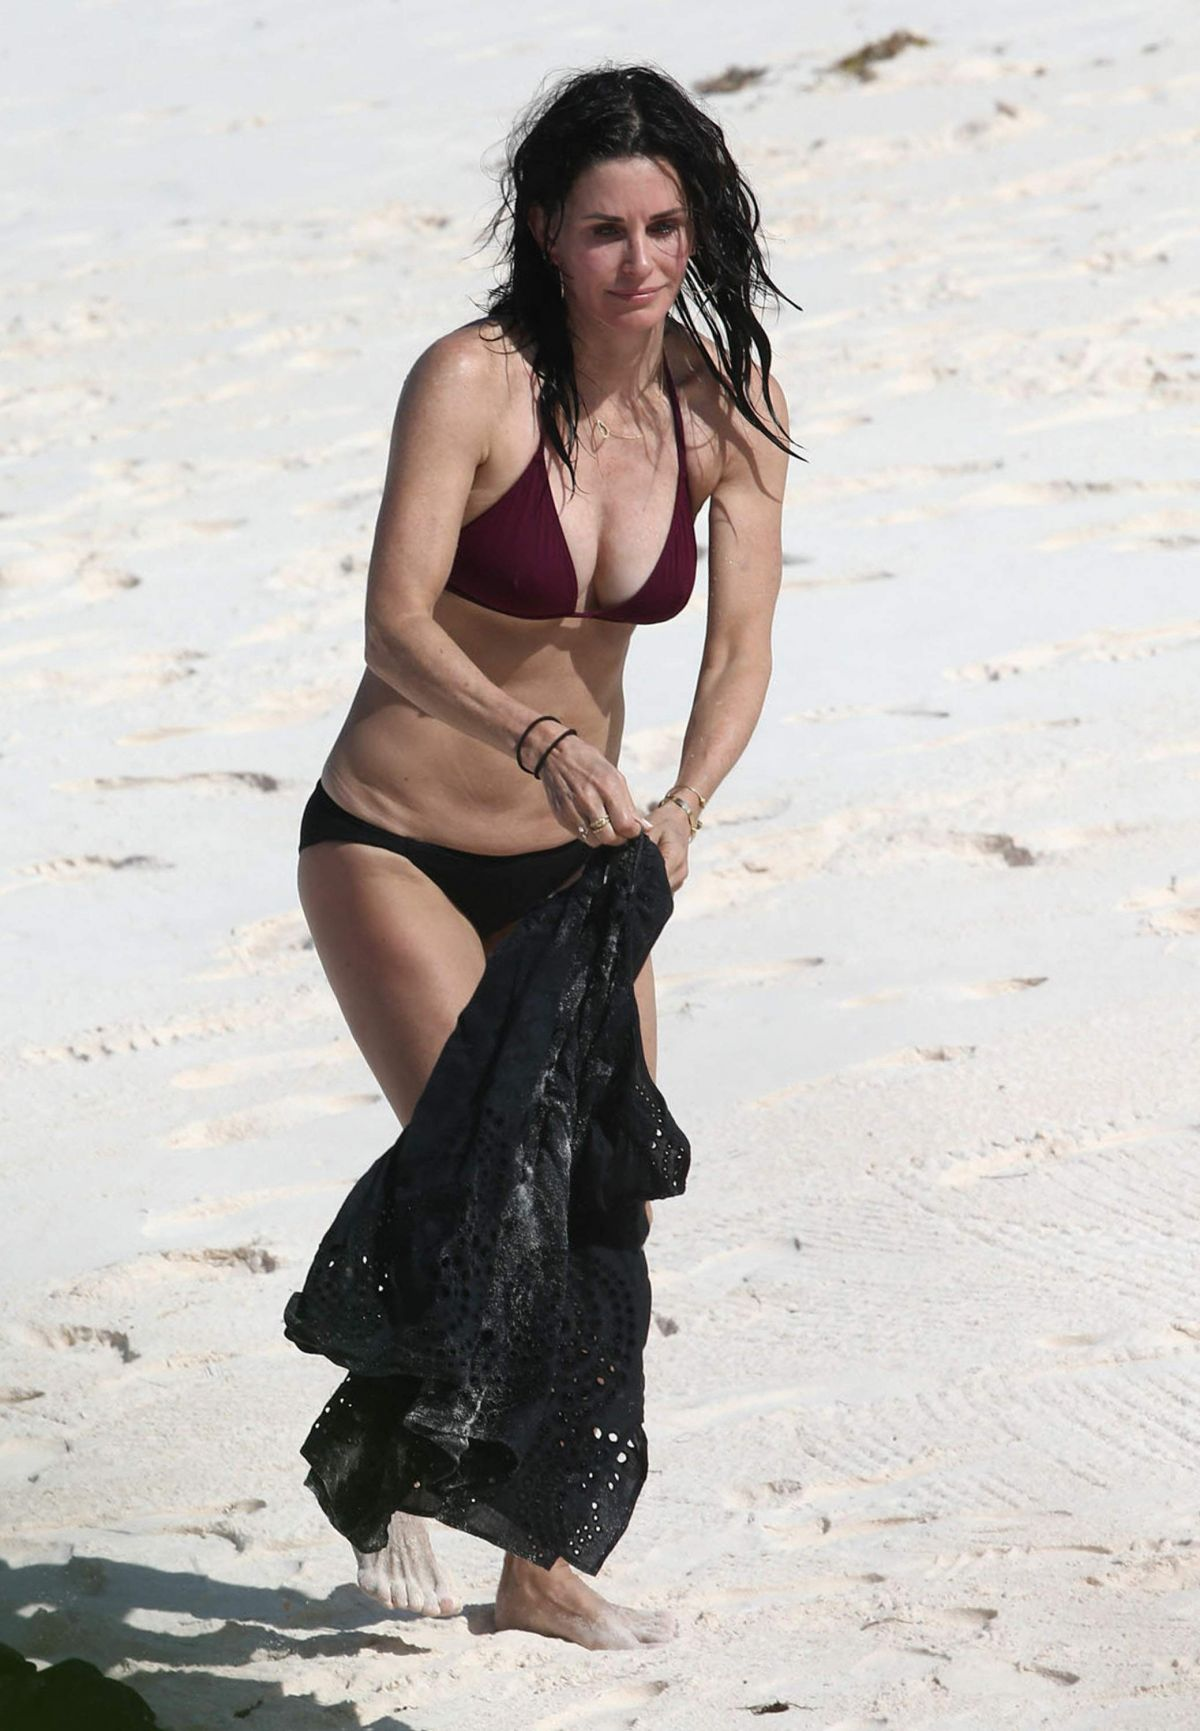 COURTENEY COX n Bikini on Vacation in Bahamas 04/03/2017 ...